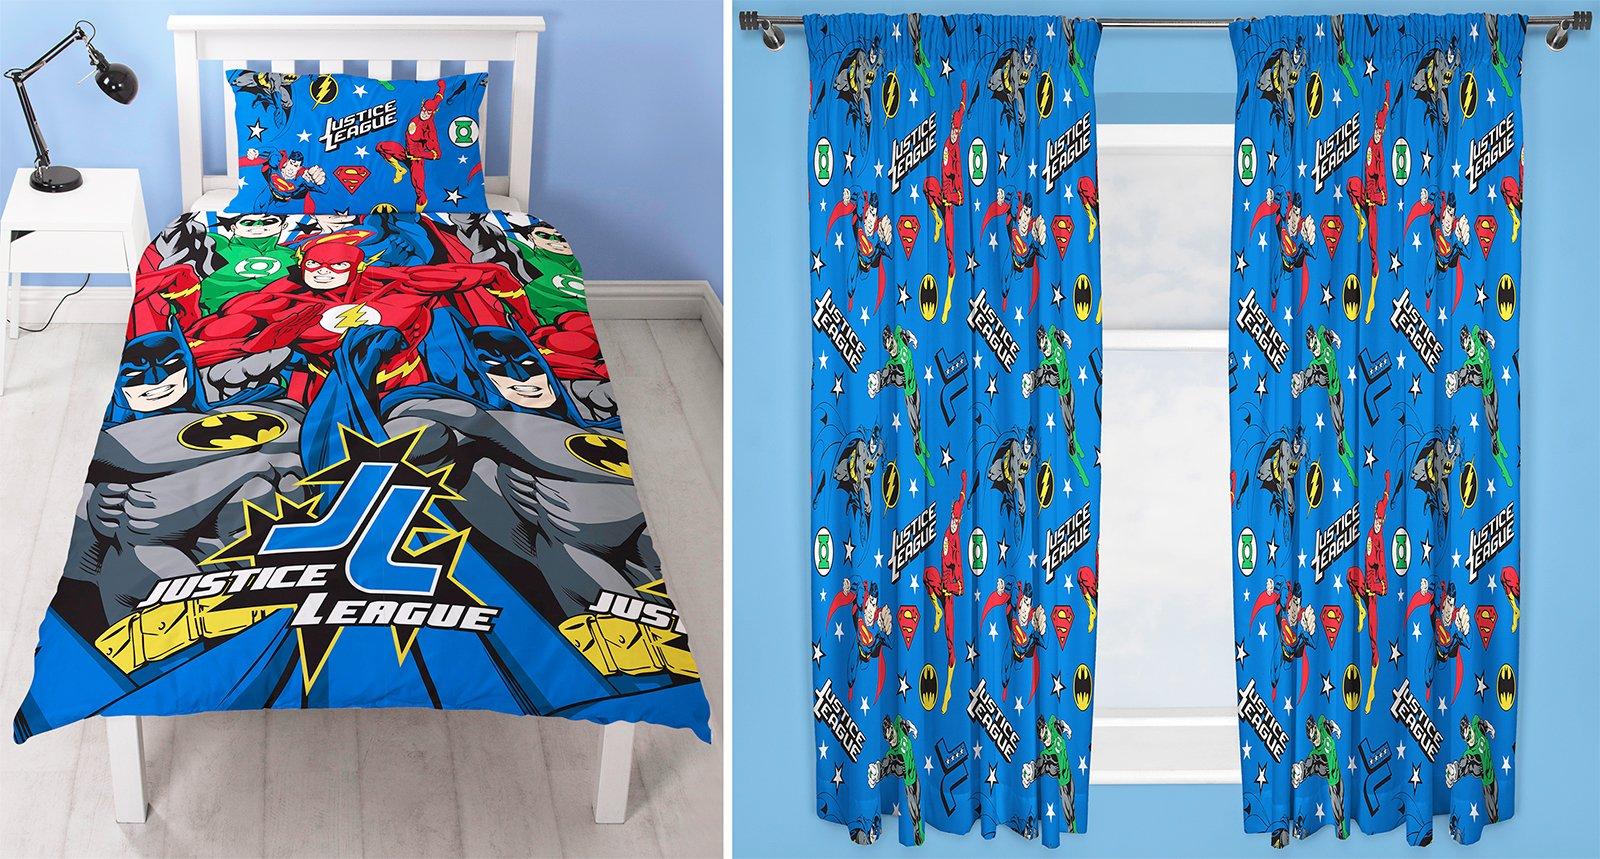 Justice League Inception Single Duvet Set and Matching 66'' x 72'' Drop Curtains